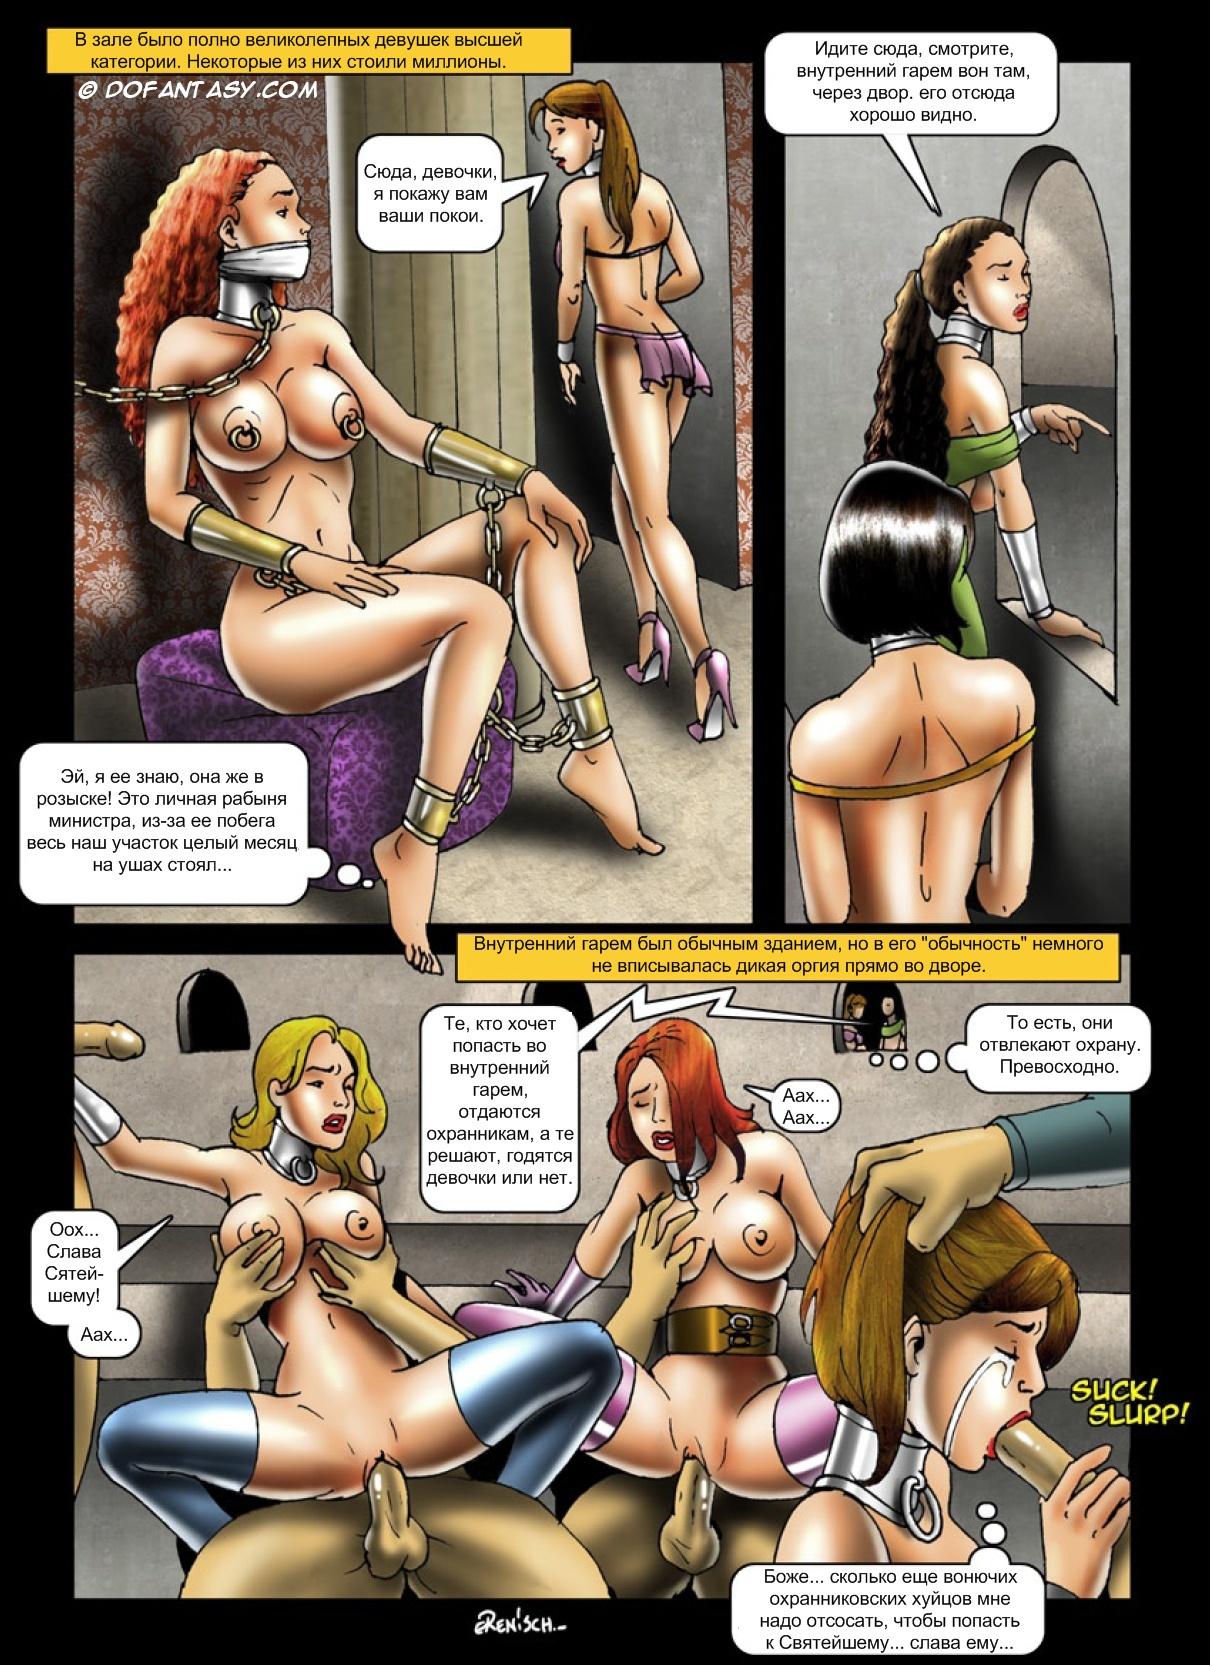 Хозяин отдал своим охранником порно онлайн 15 фотография